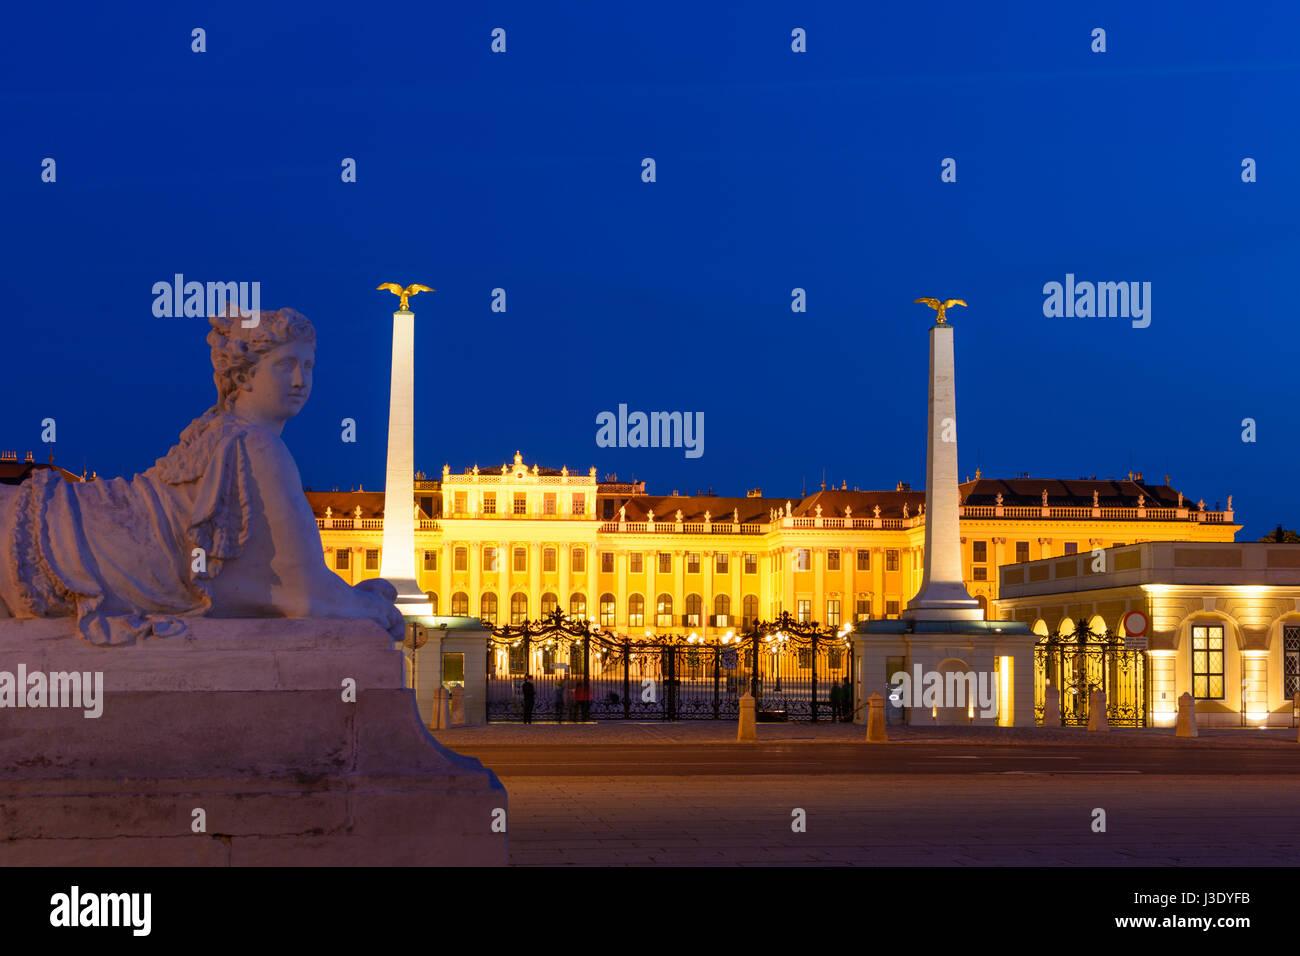 castle Schönbrunn Palace Schloss from outside main entrance, sphinx, Wien, Vienna, 13. Hietzing, Wien, Austria - Stock Image